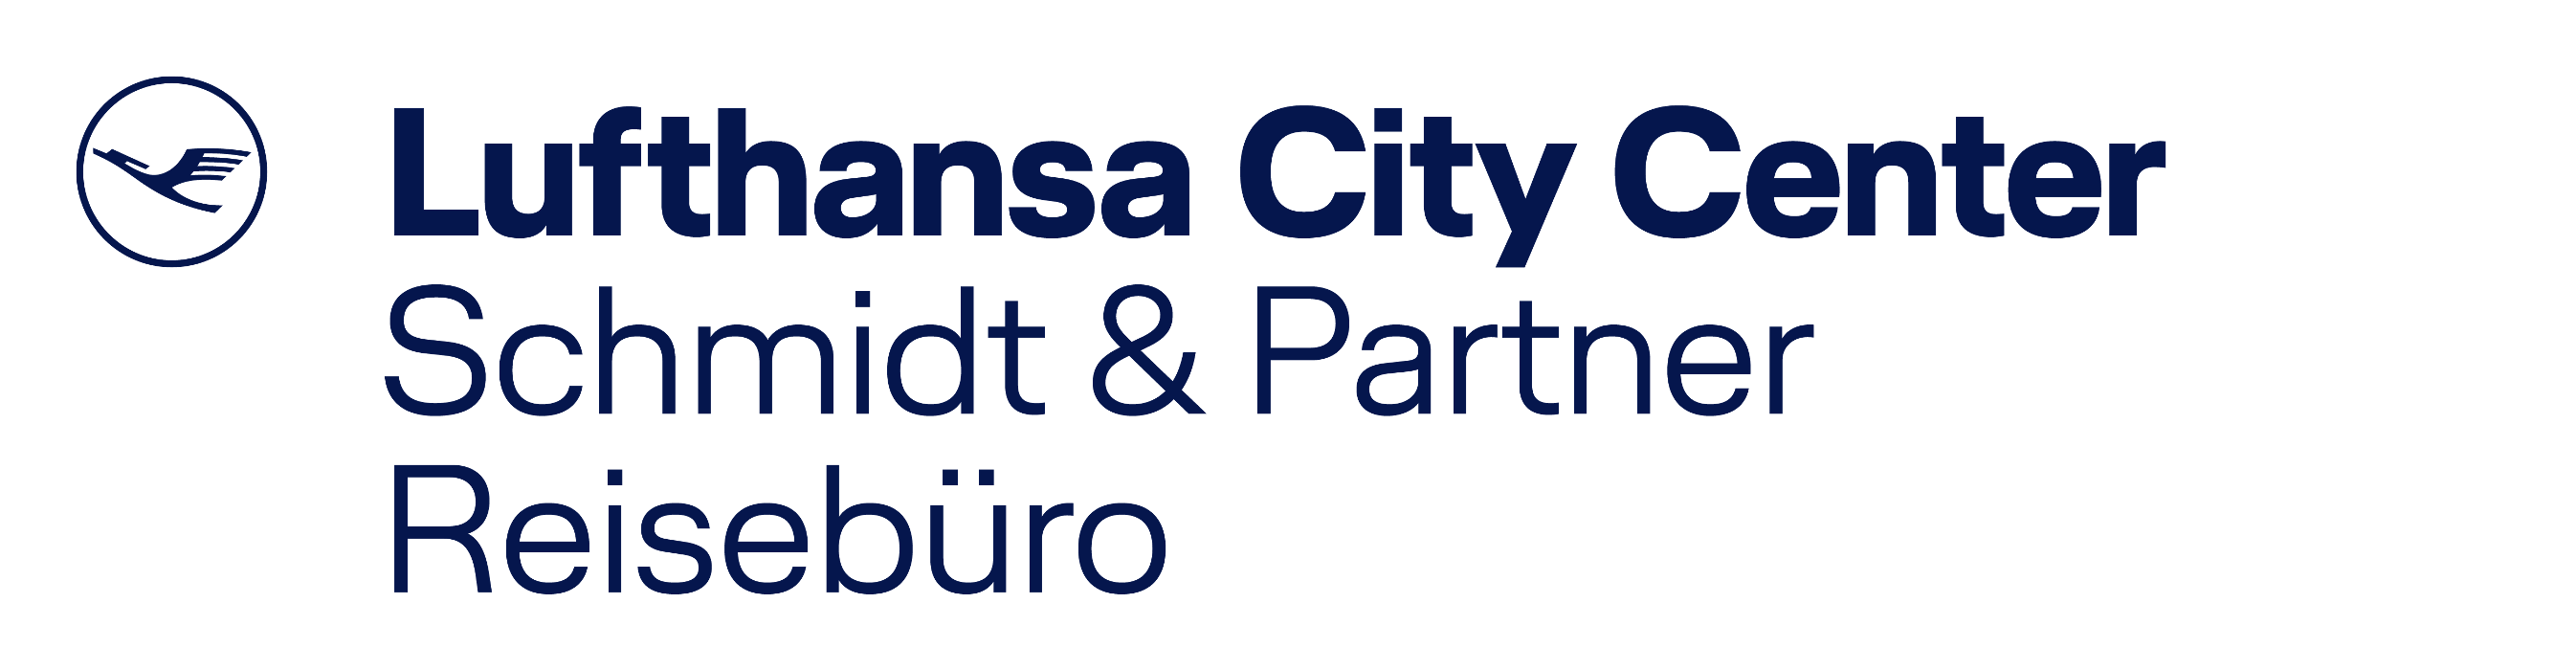 Schmidt & Partner Reisebüro GmbH Lufthansa City Center